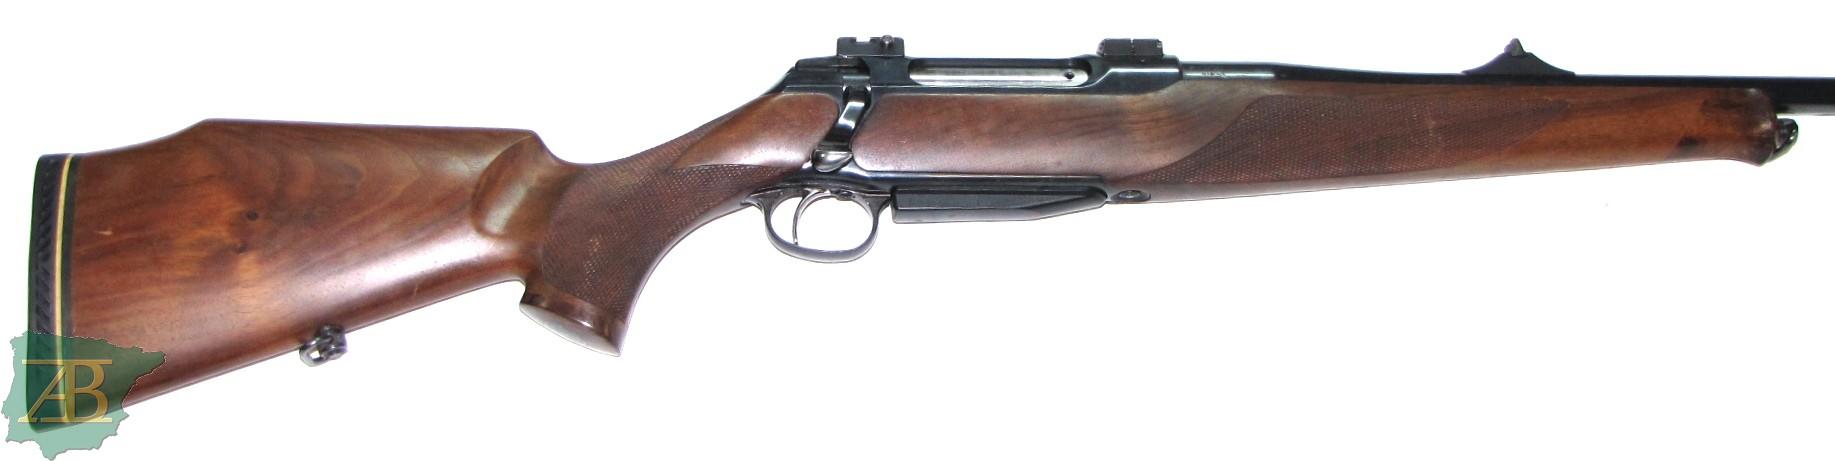 Rifle de cerrojo de caza SAUER 202 Ref REP2021-226-armeriaiberica-2